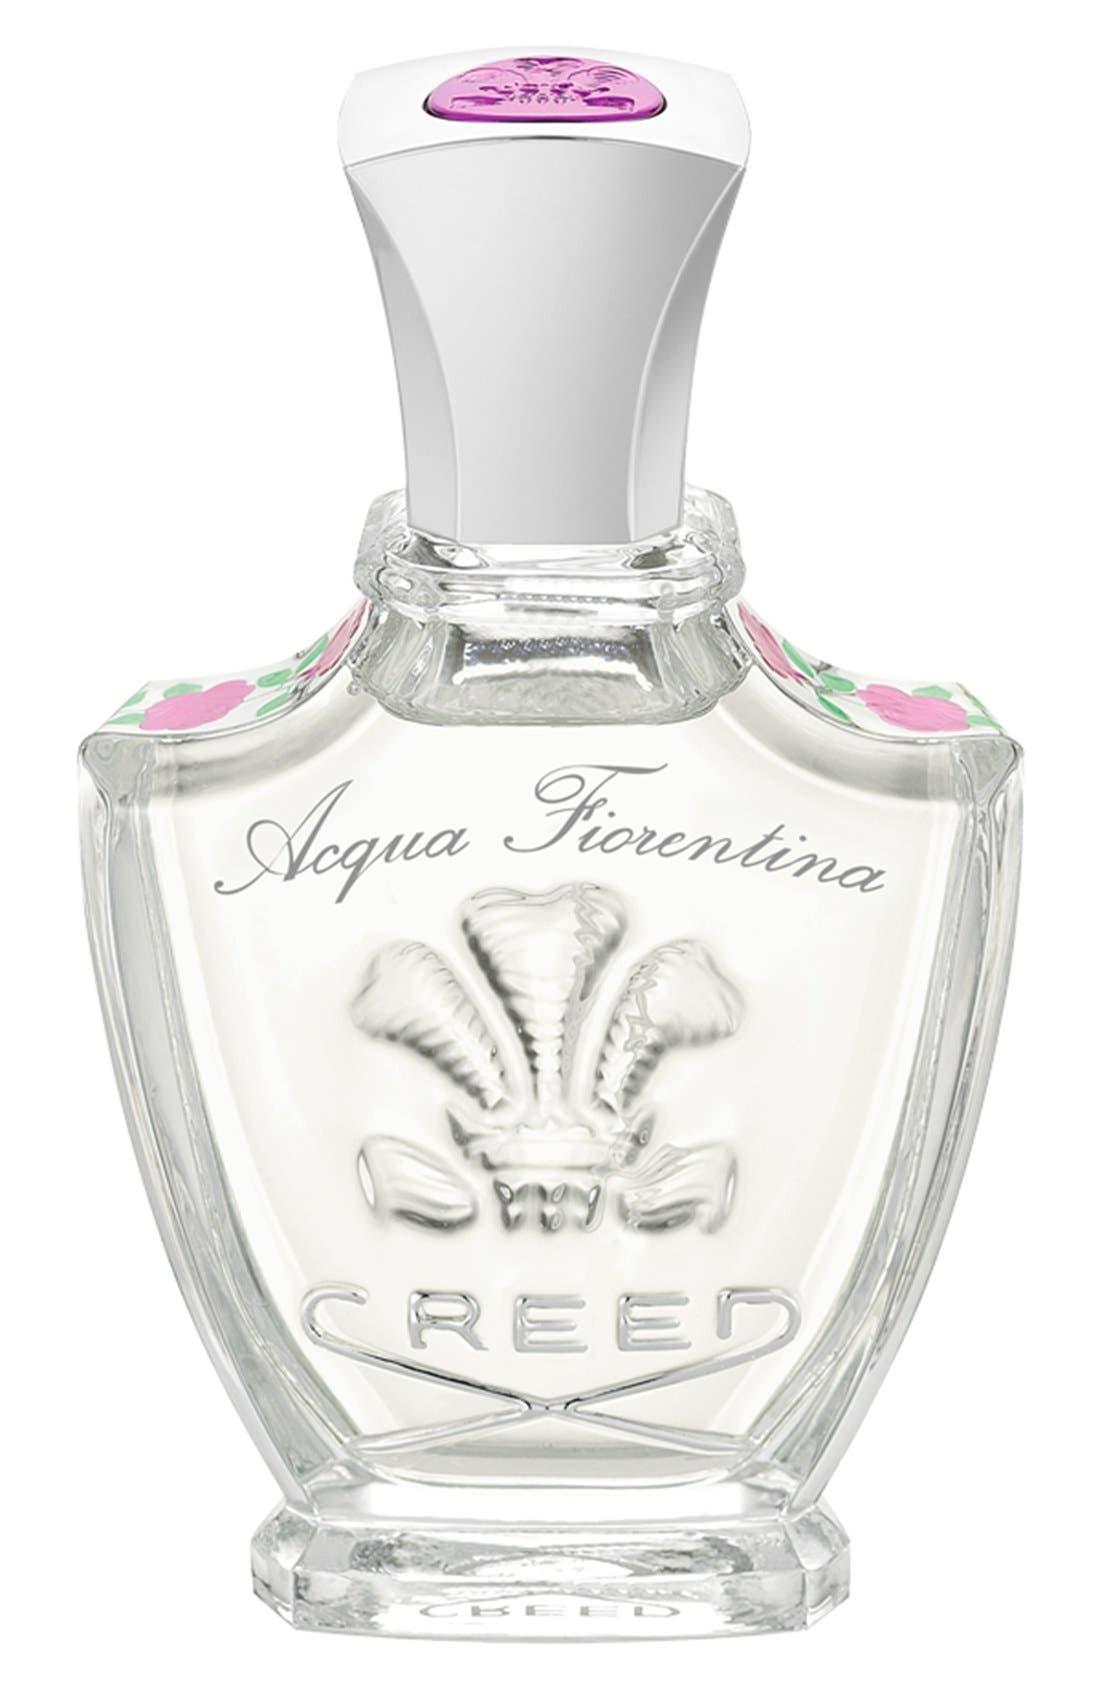 'Acqua Fiorentina' Fragrance,                             Main thumbnail 1, color,                             NO COLOR